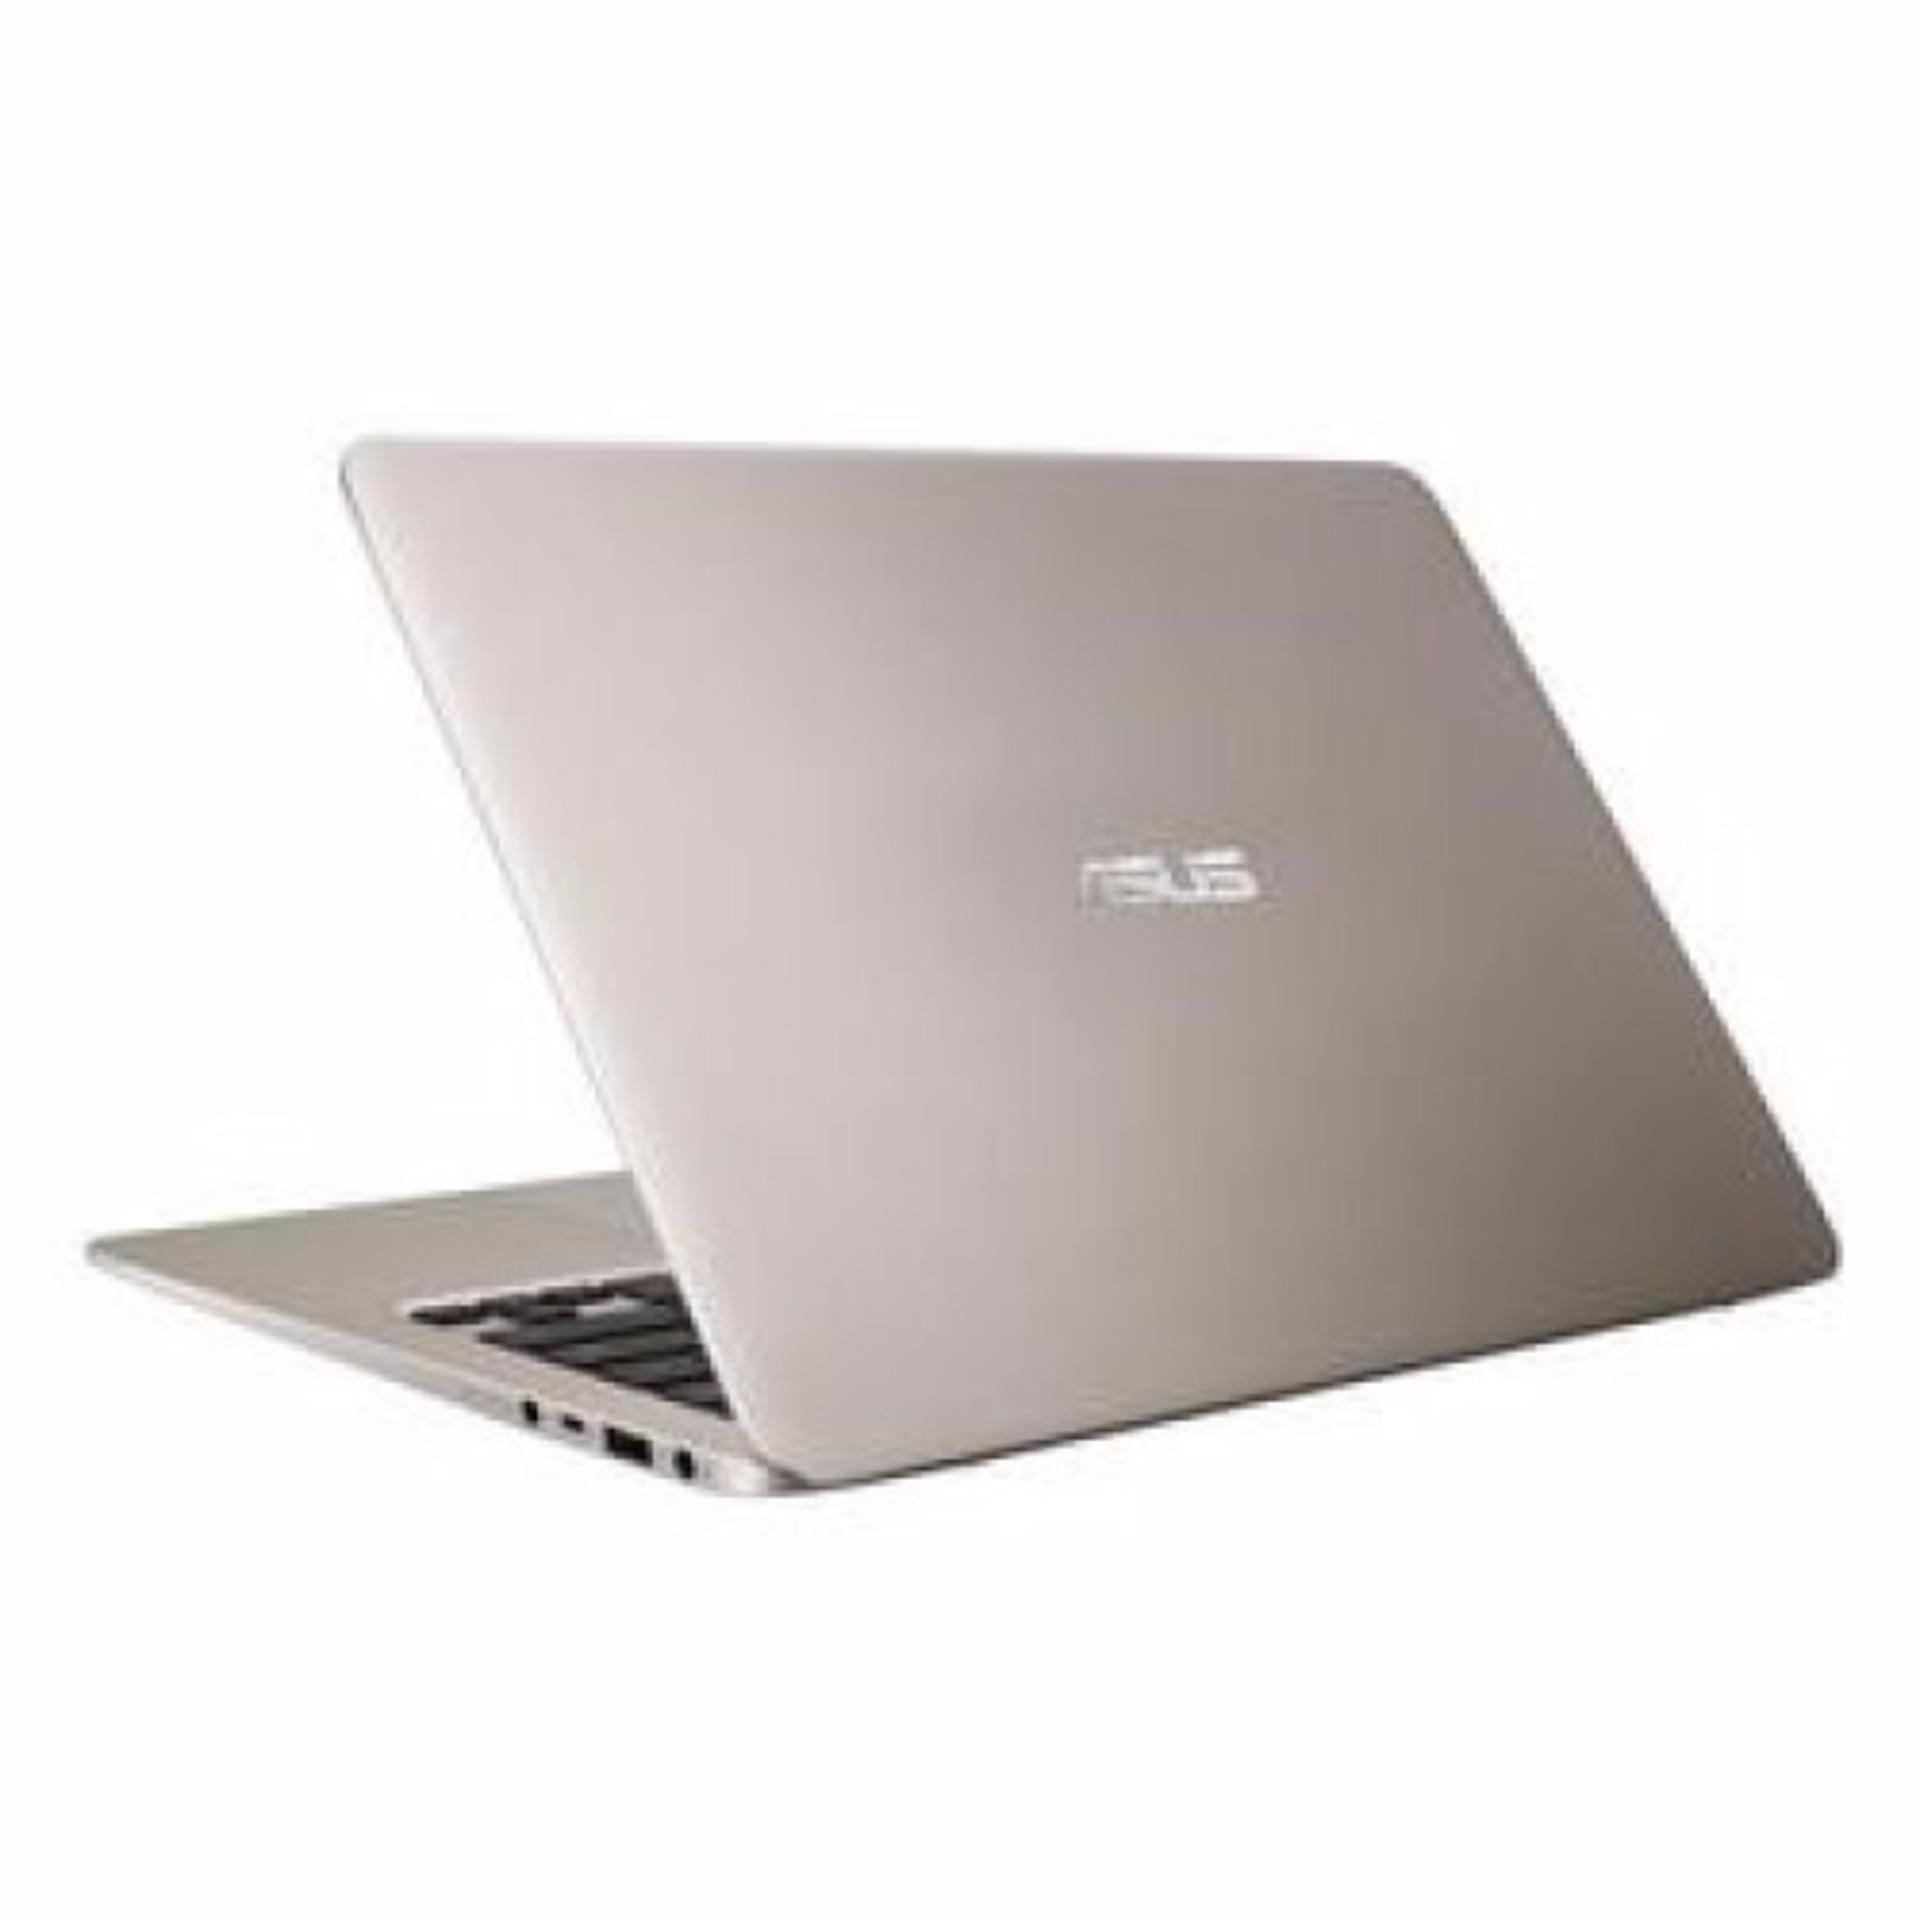 Asus A456ur Ga092d Core I5 7200u 14 4gb 1tb Gt930mx 2gb Dos Gold Wx039d Notebook Red Inch 6200u 4 Gb 1 Tb Intel Nvidia